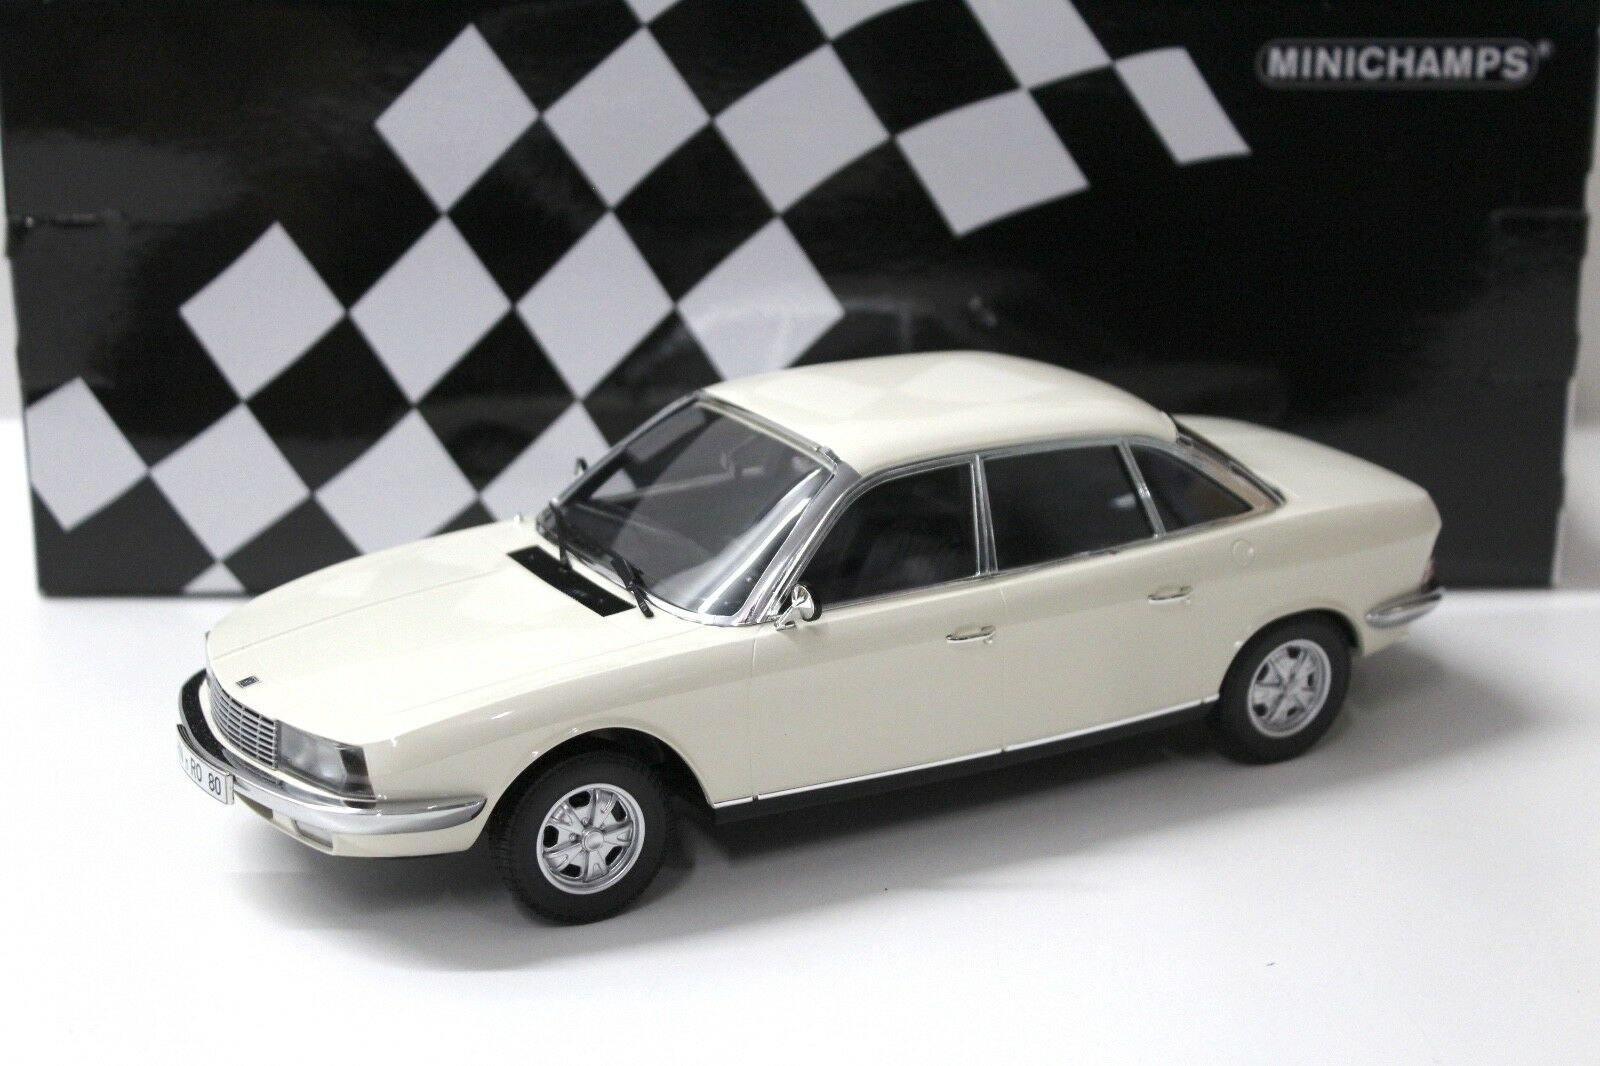 1 18 Minichamps Audi NSU Ro 80 blanco 1972 New en Premium-modelCoches